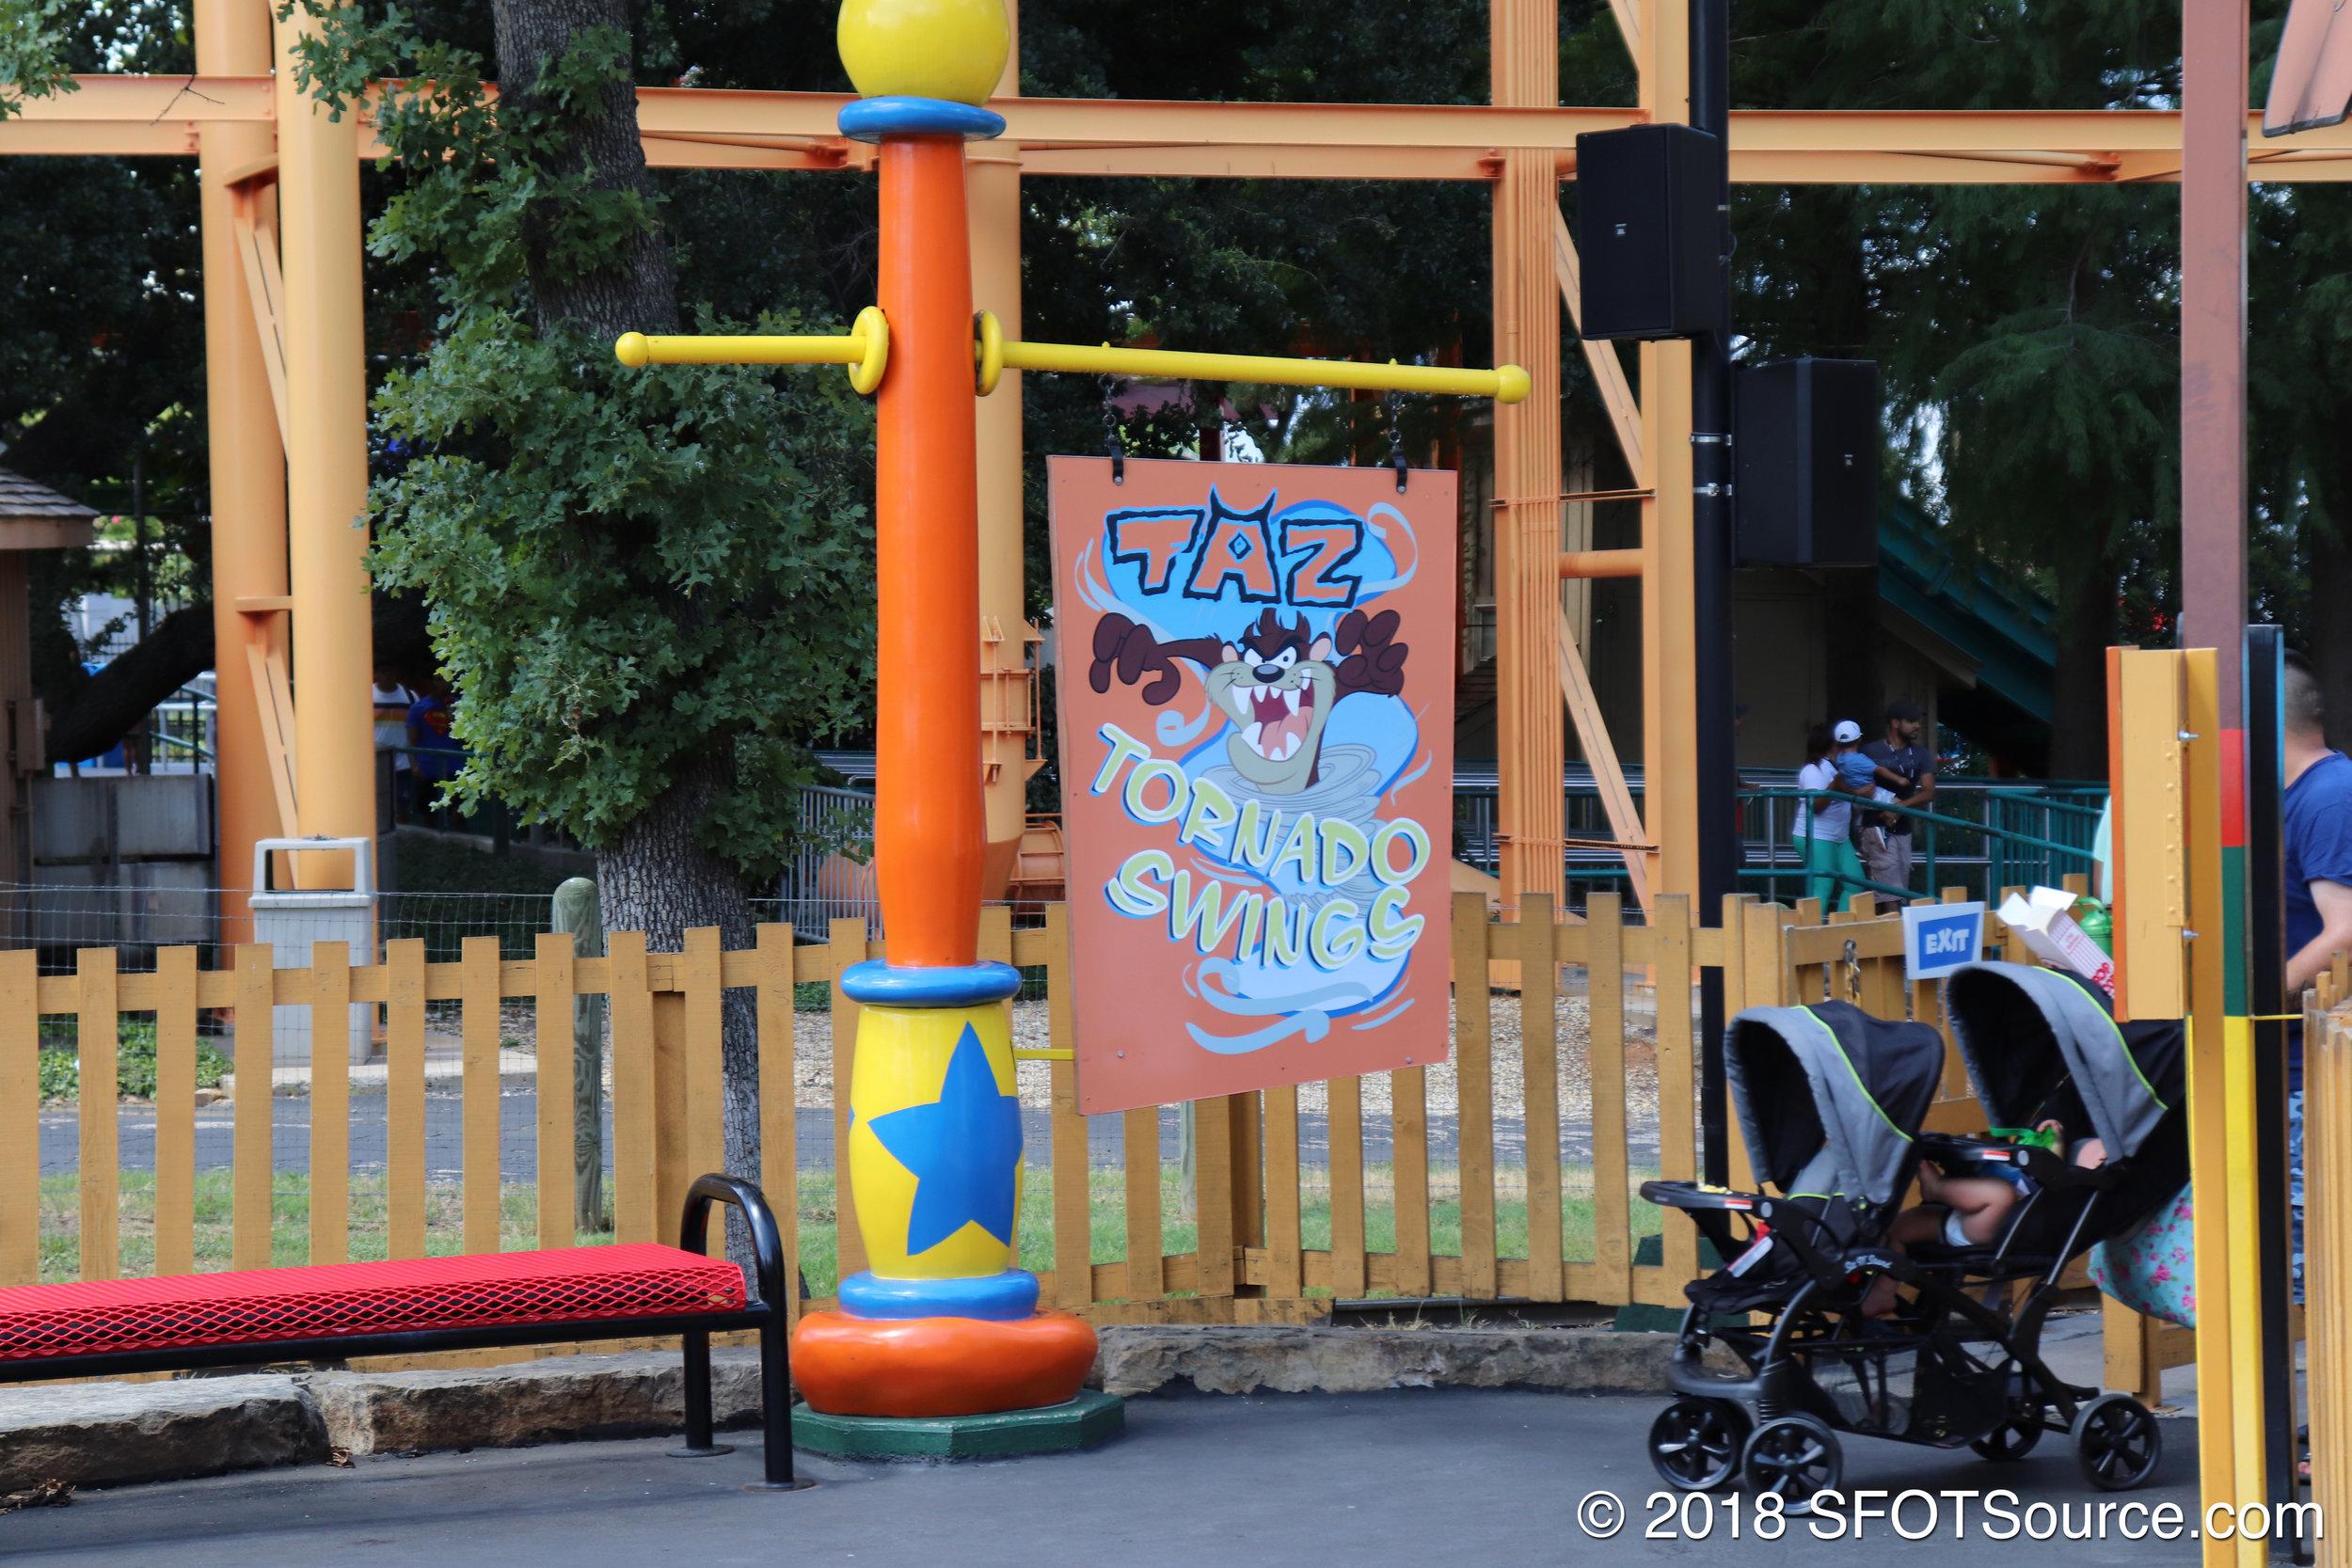 The main sign for Taz Tornado Swings.